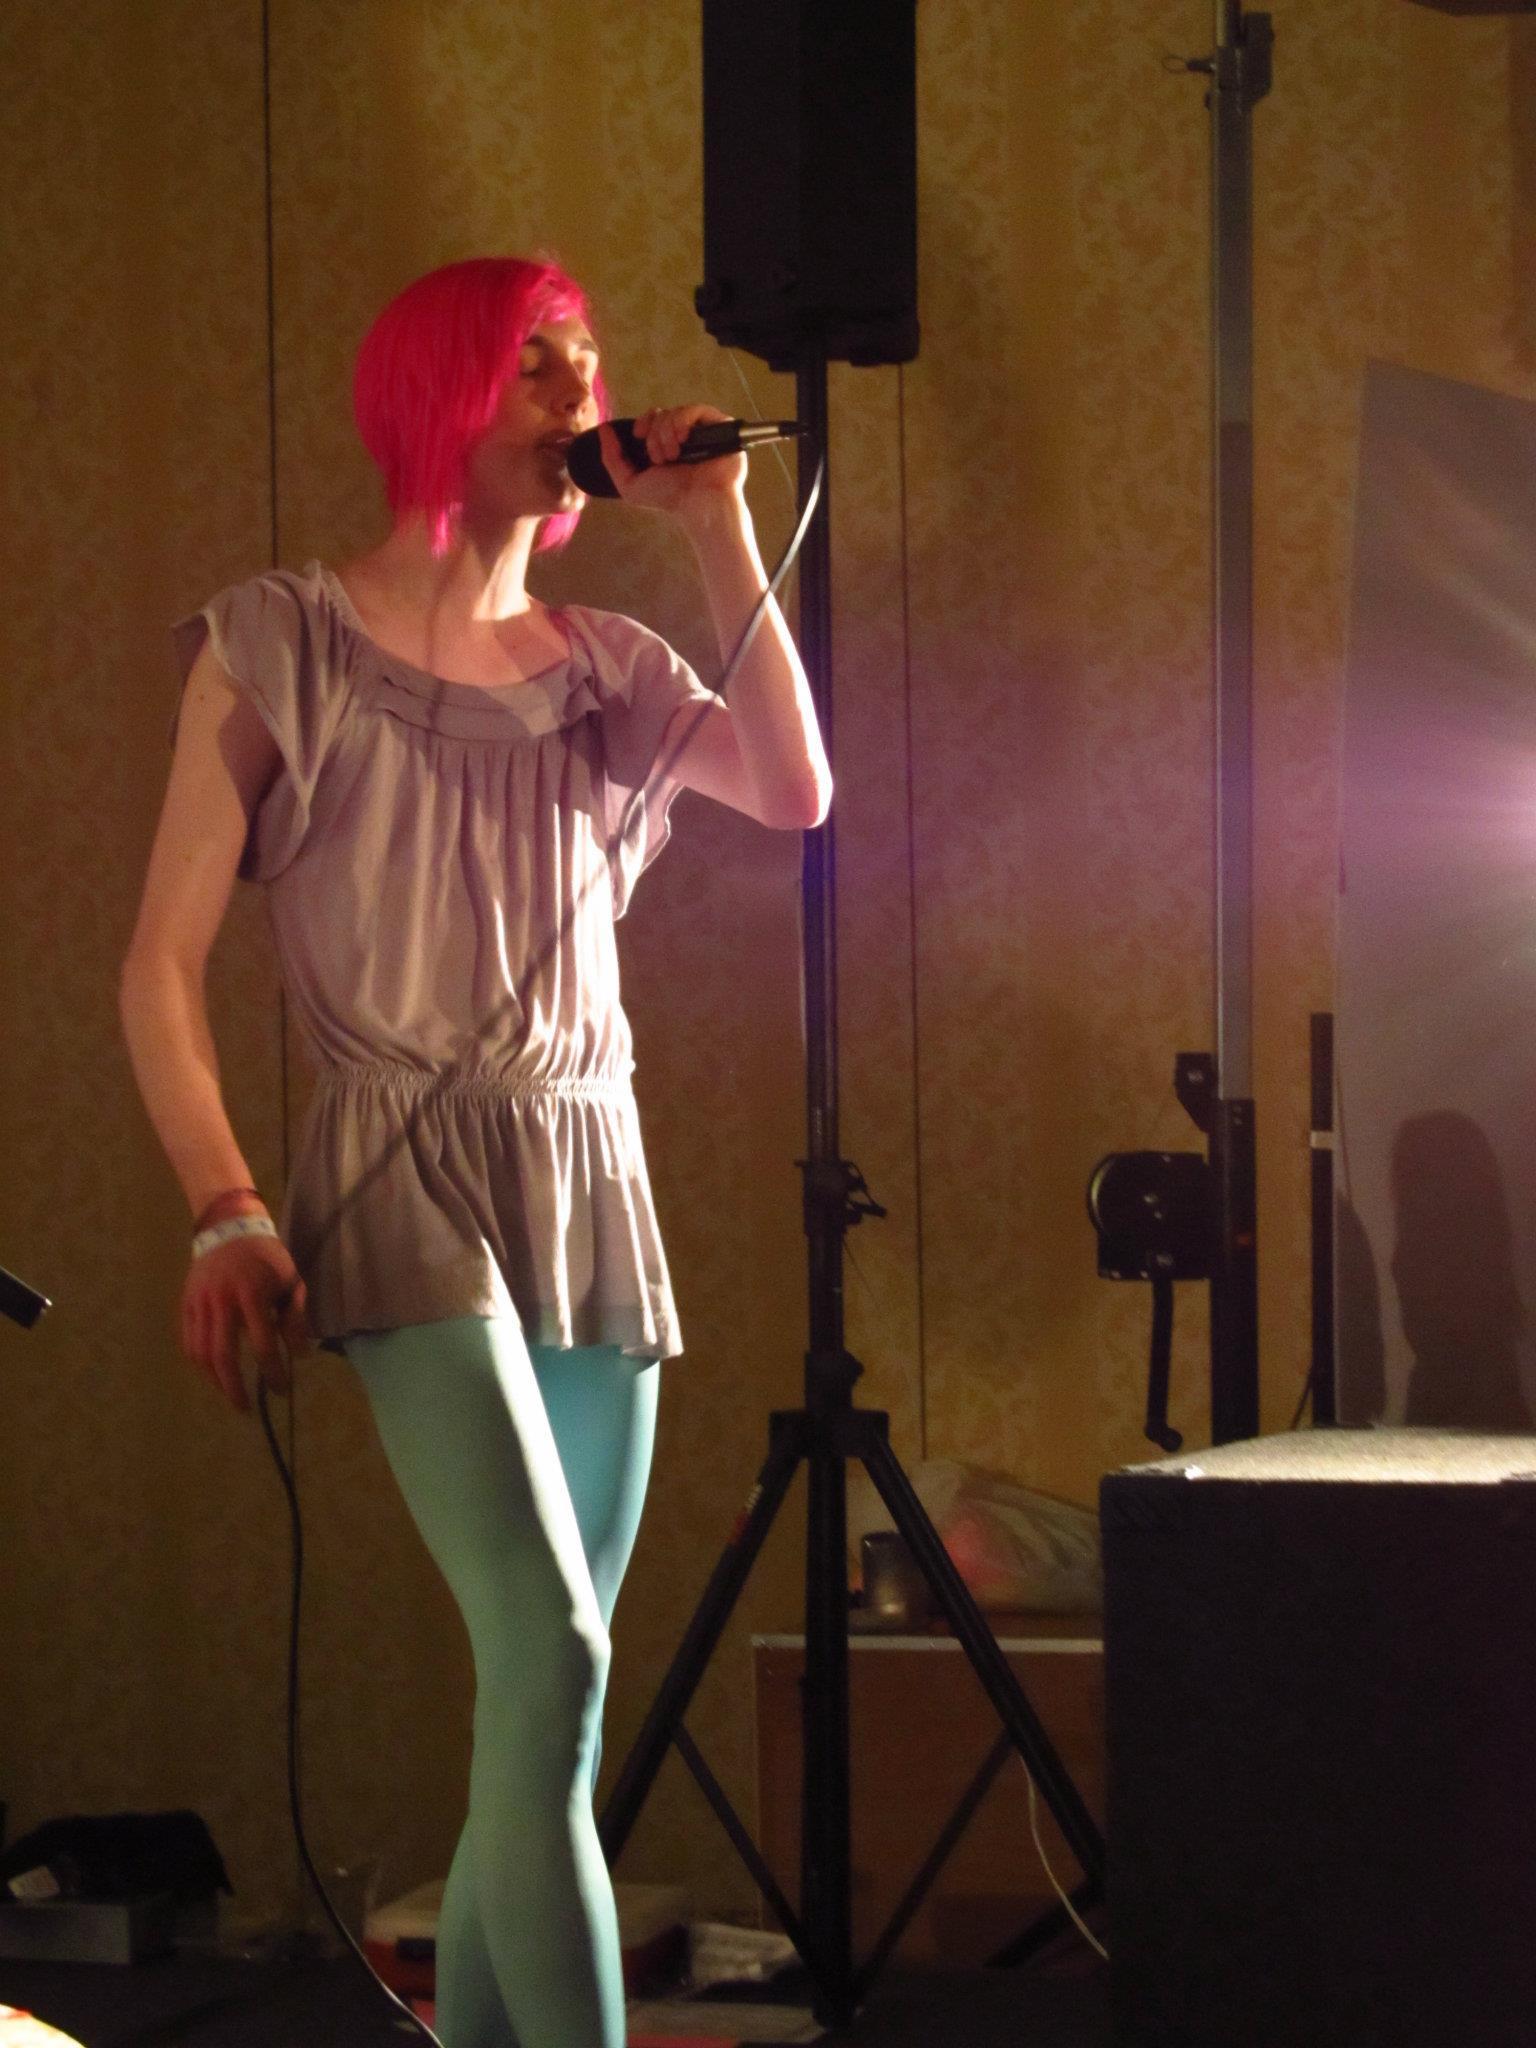 Robbi onstage at Chibi-Pa MOTO. Photo by Dezmaralla Nowell